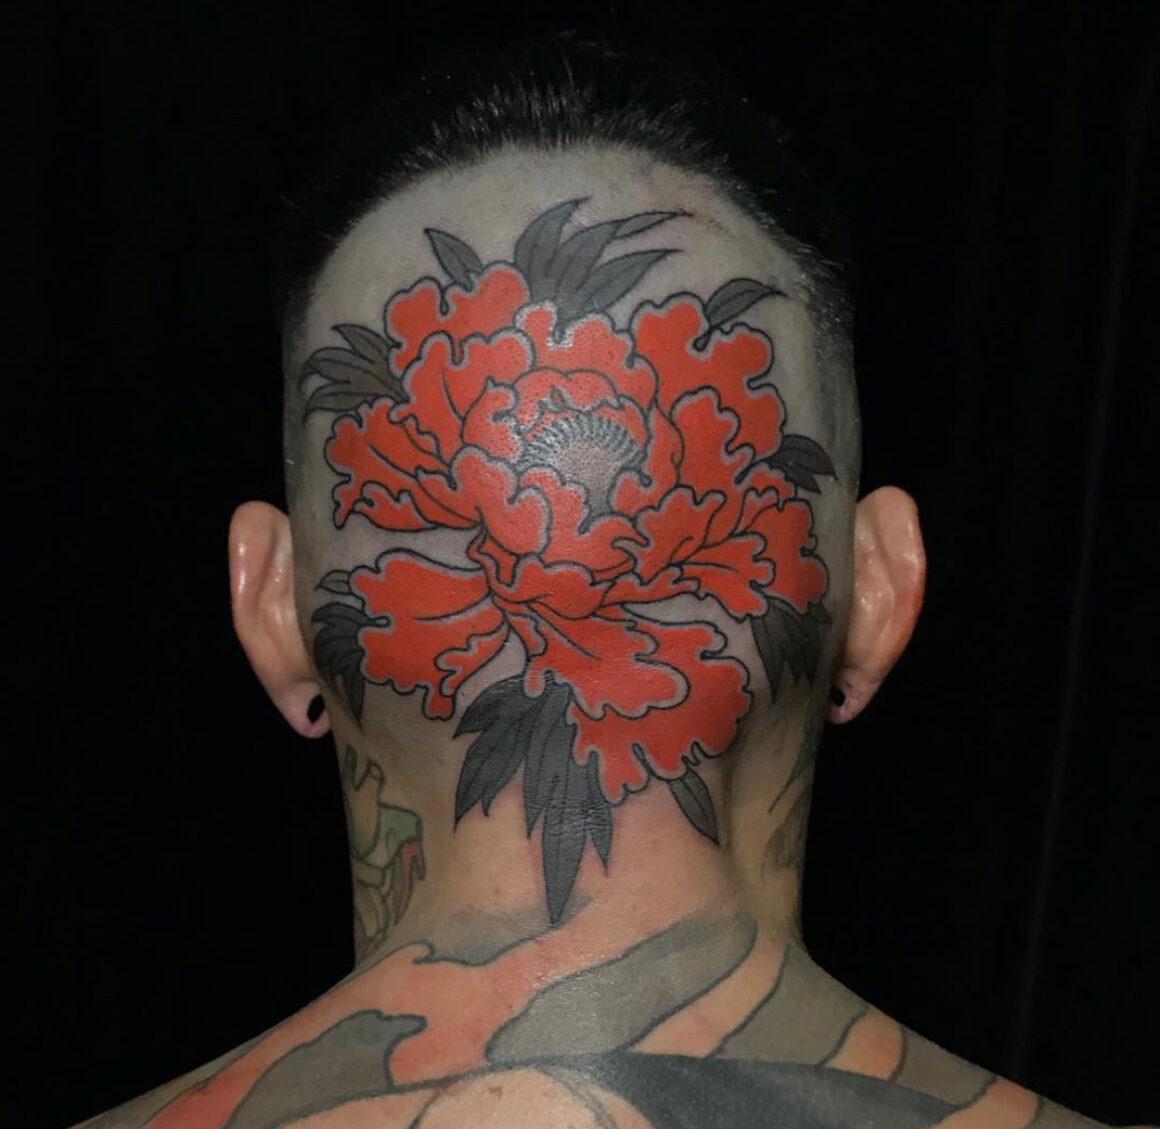 Matthew Mooney, Daggers & Lark Tattoo, Bayswater, Australia